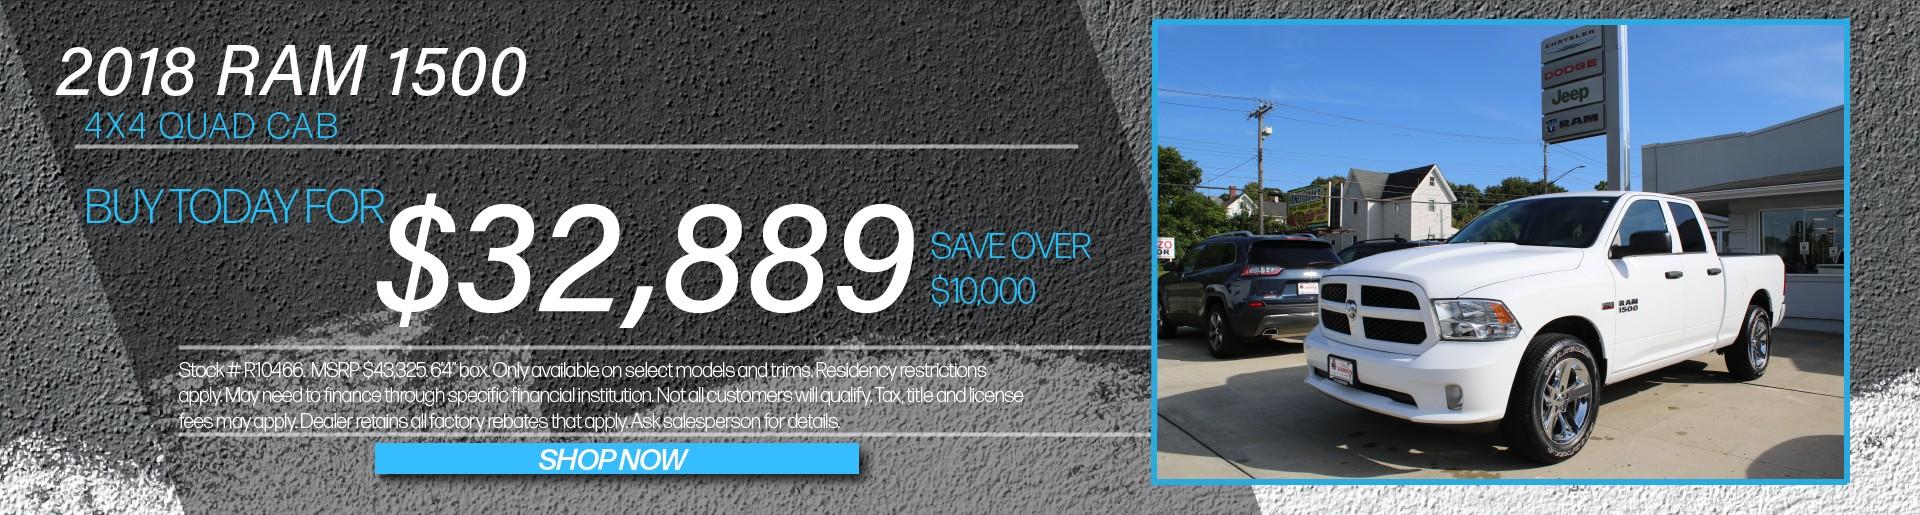 2018 Ram 1500 4x4 Quad Cab Buy Today For $32,889